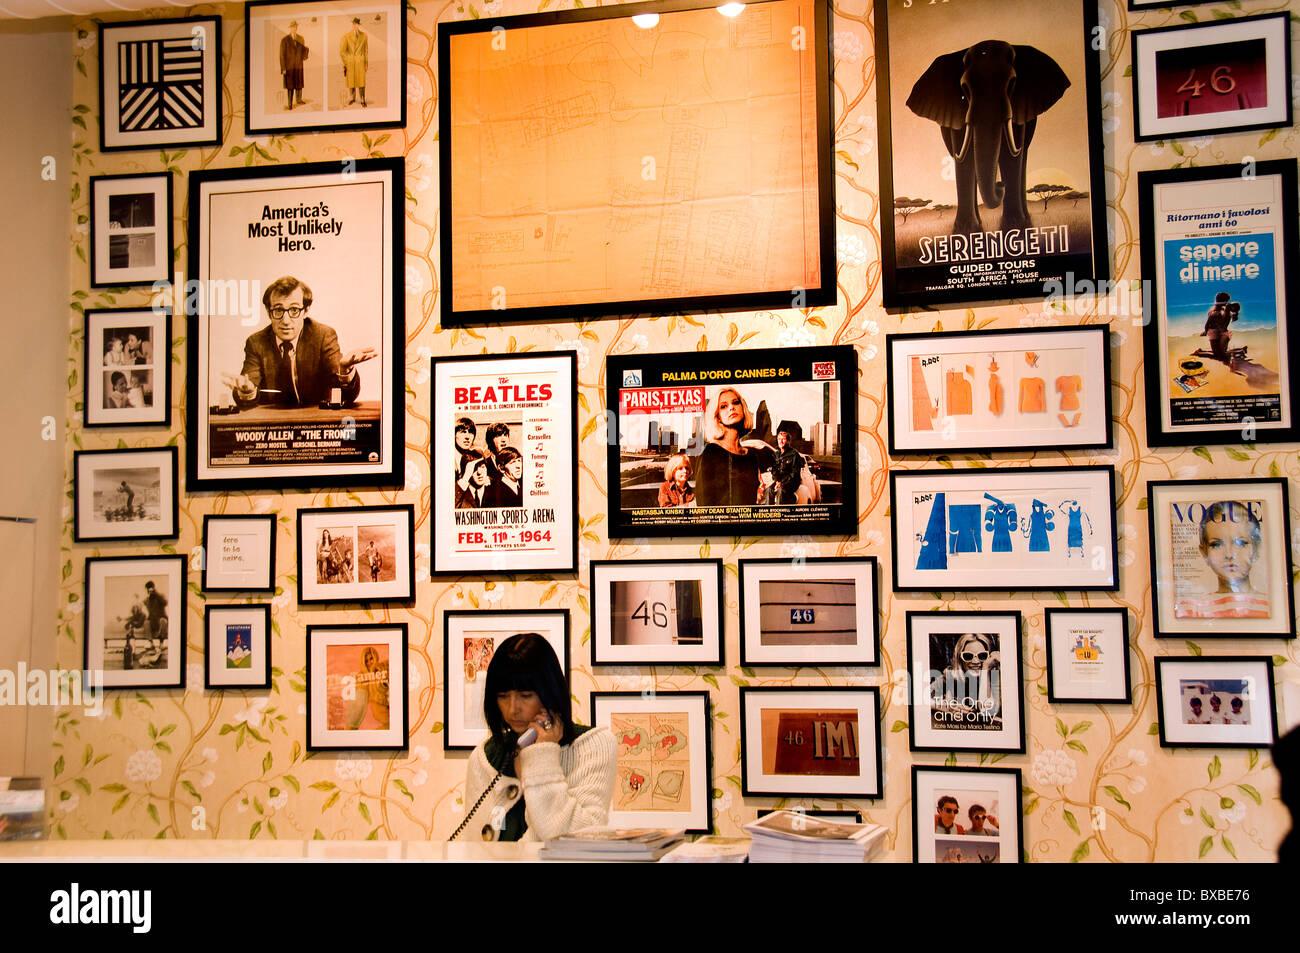 Bilbao Spain Spanish Woody Allen acting drama comedy music  Beatles - Stock Image